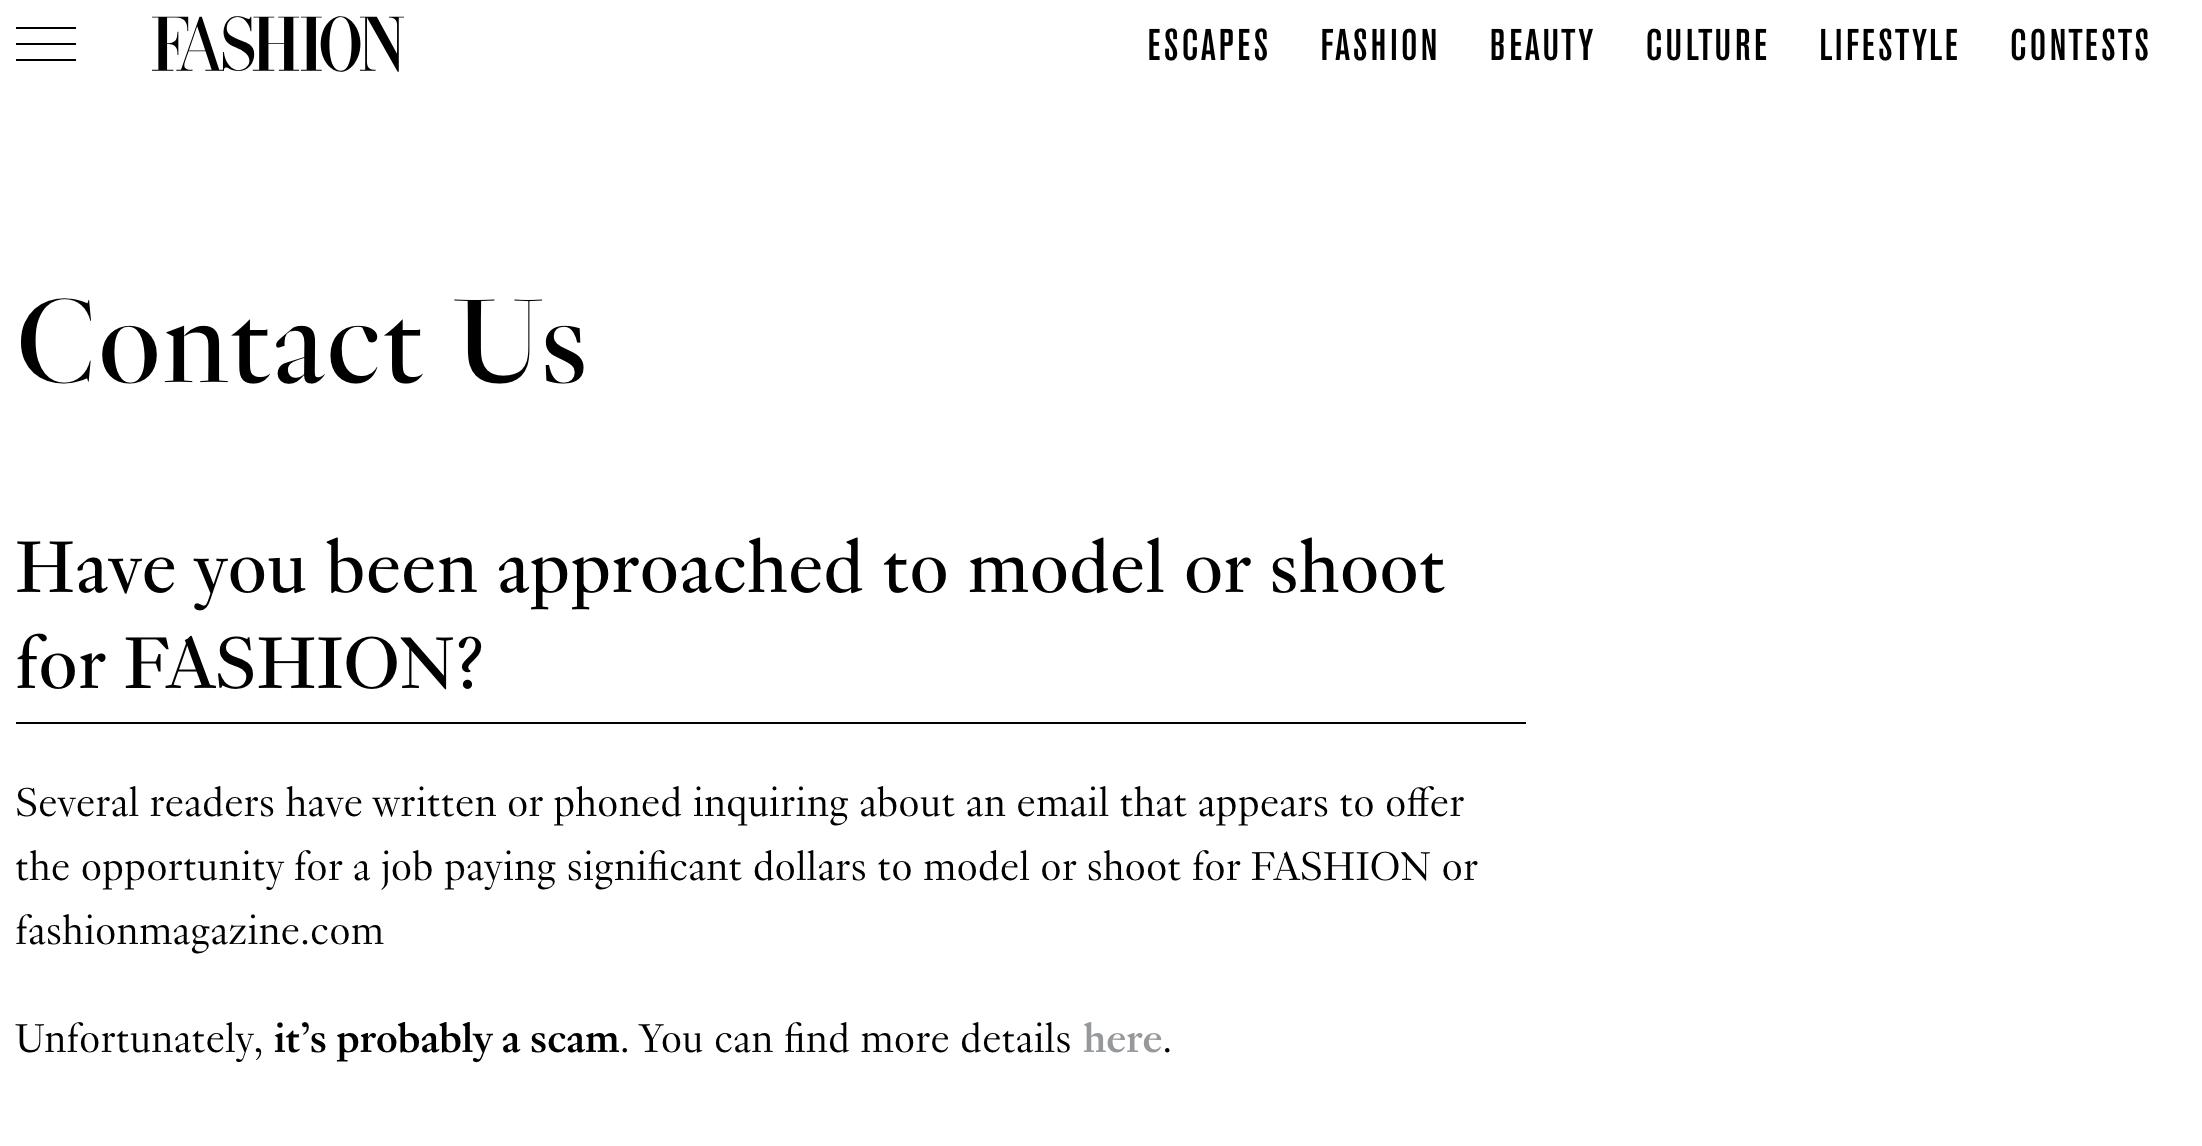 fashion magazine scam